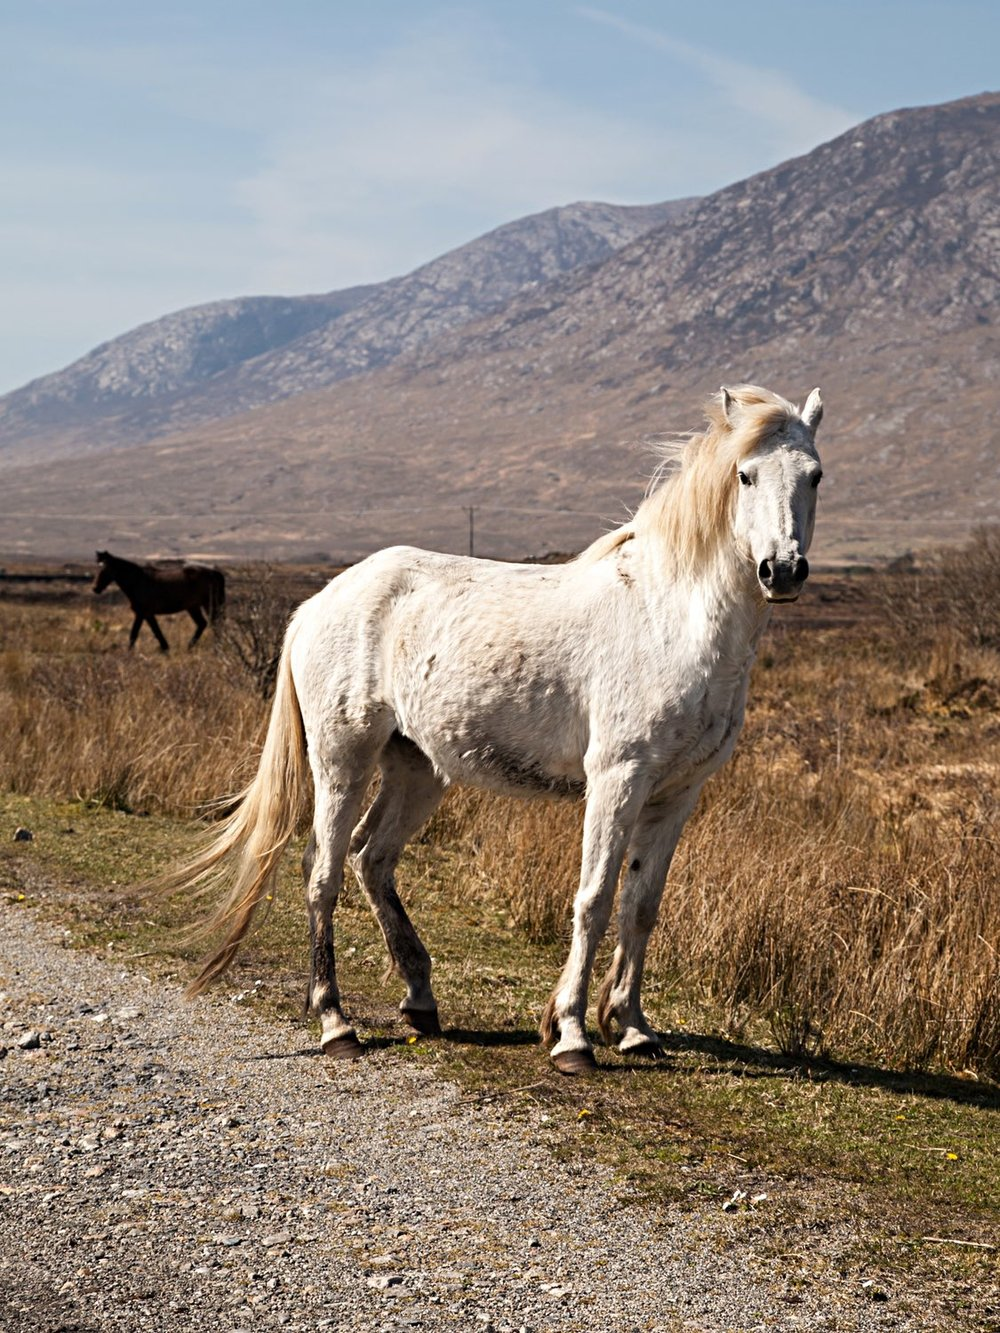 connemara-life-connemara-pony-41.jpg